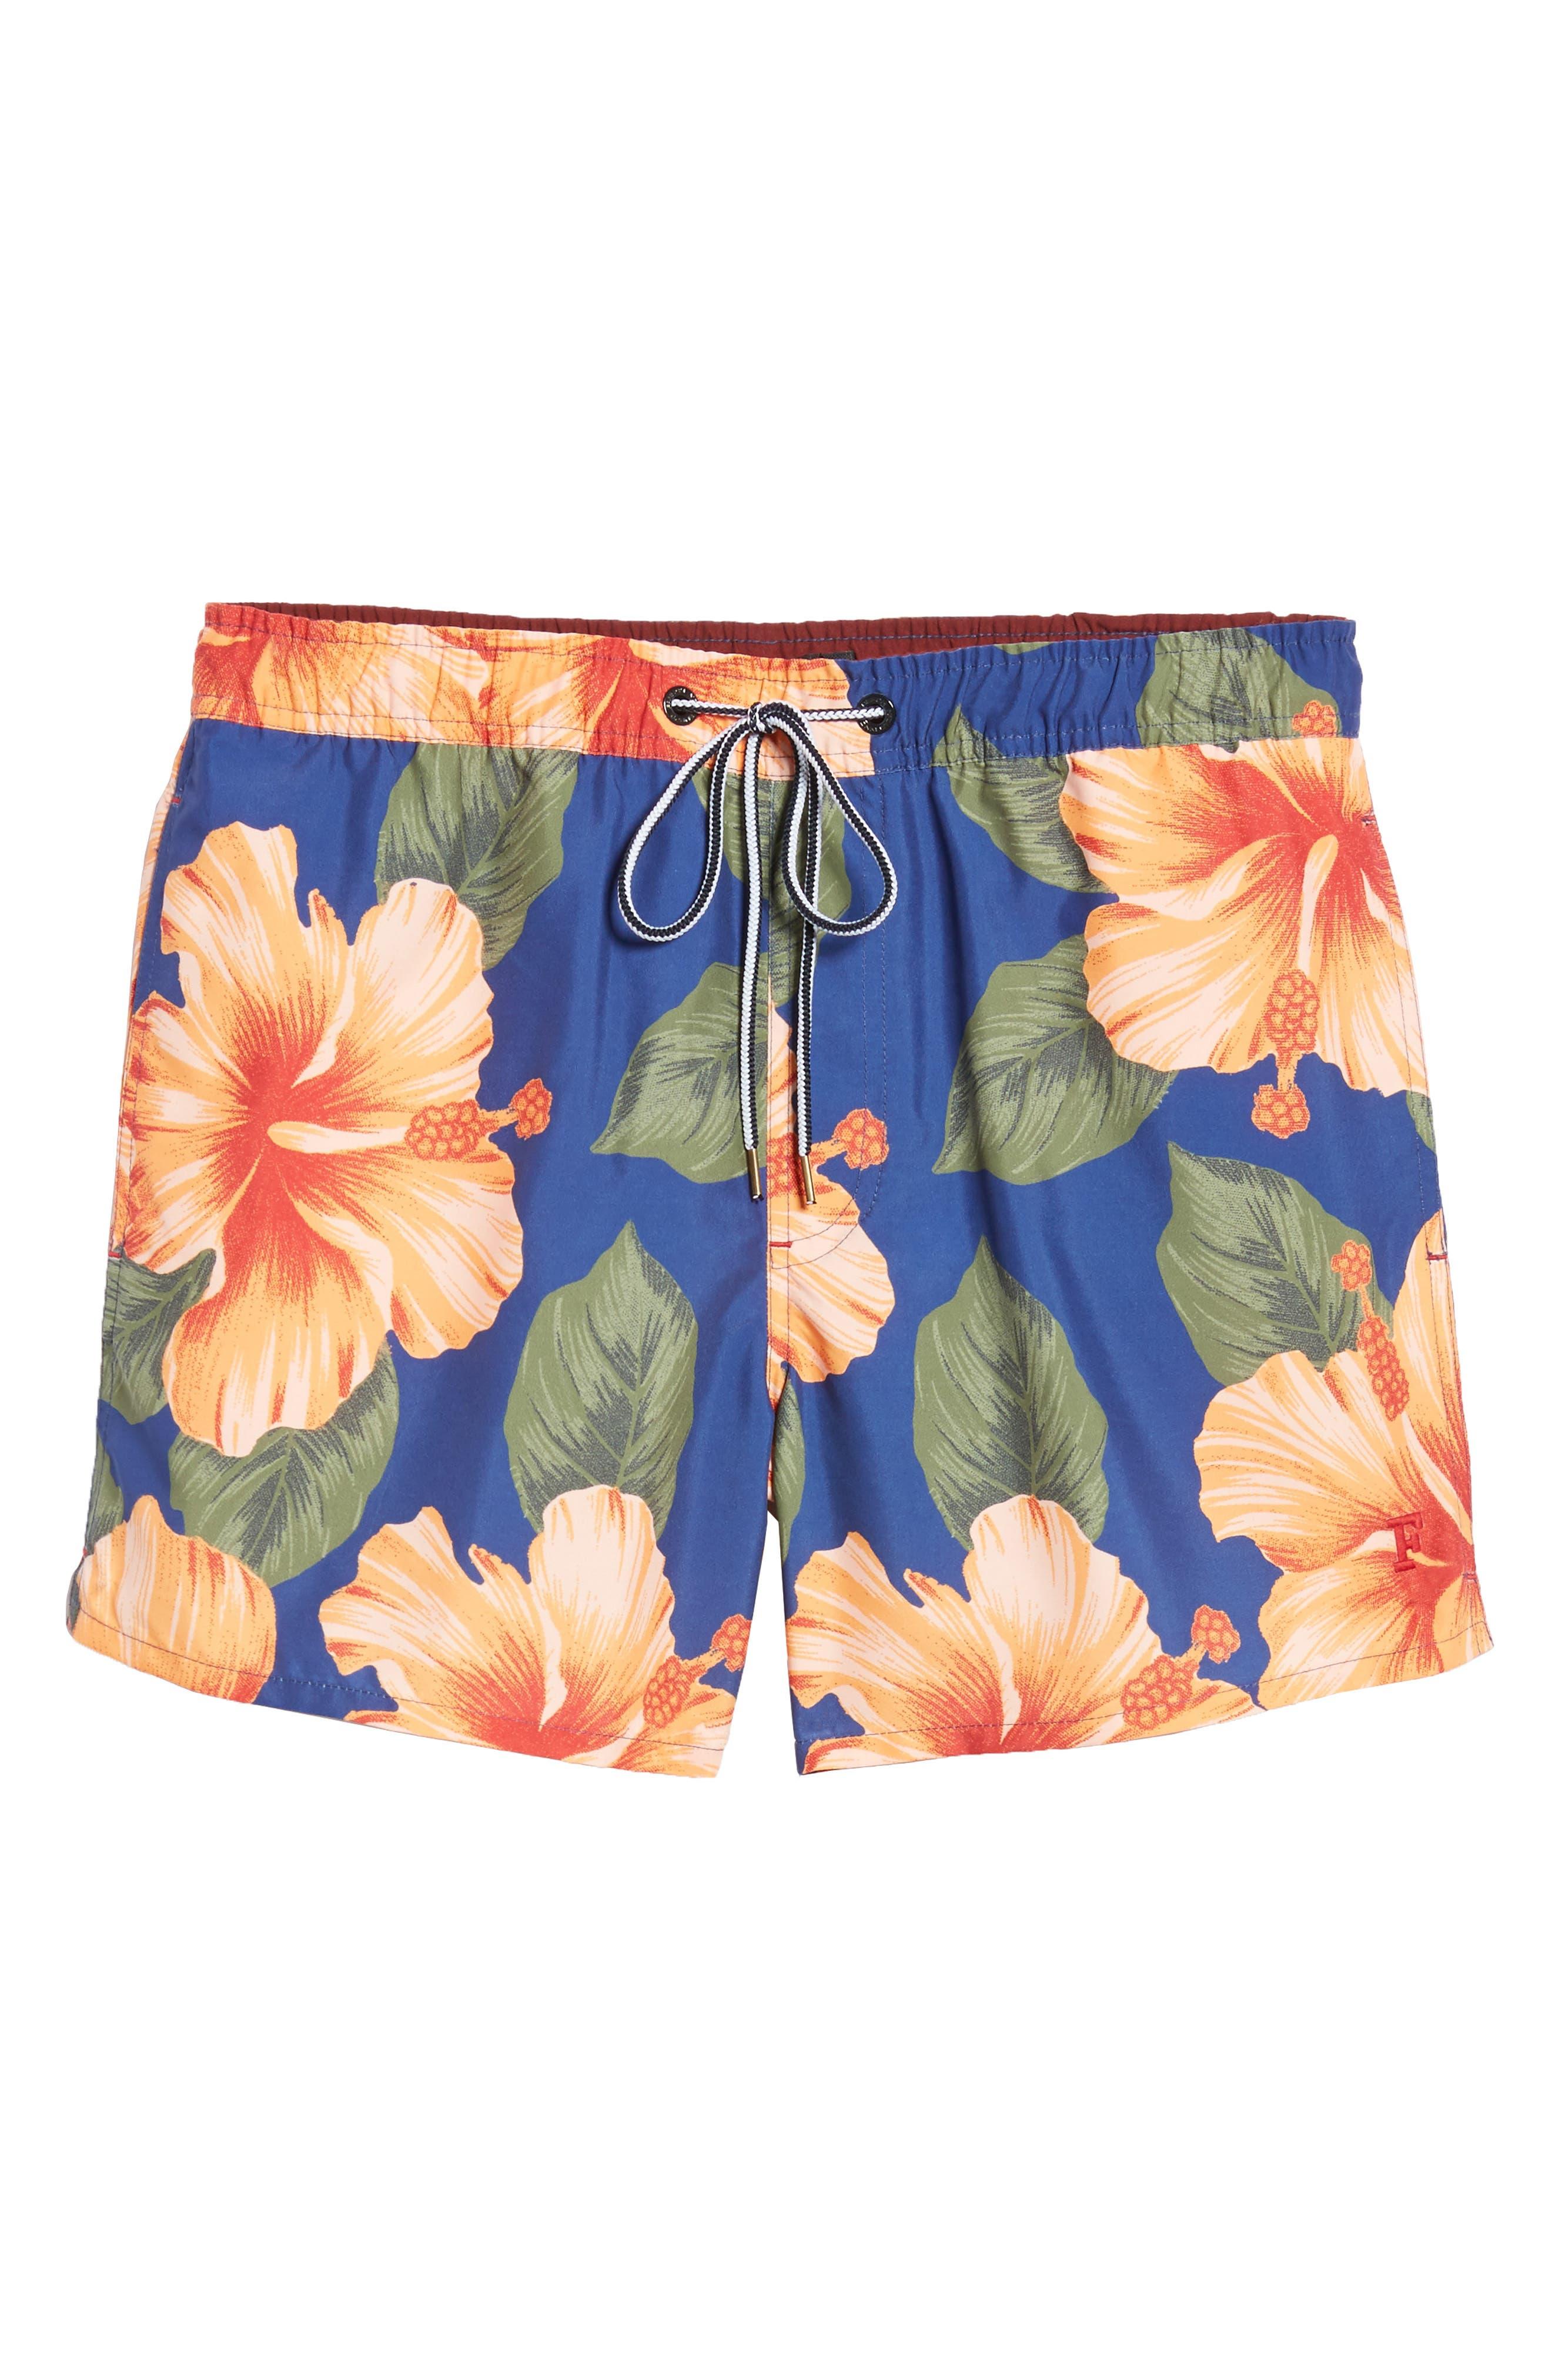 Wela Hawaiian Slim Fit Swim Trunks,                             Alternate thumbnail 6, color,                             401